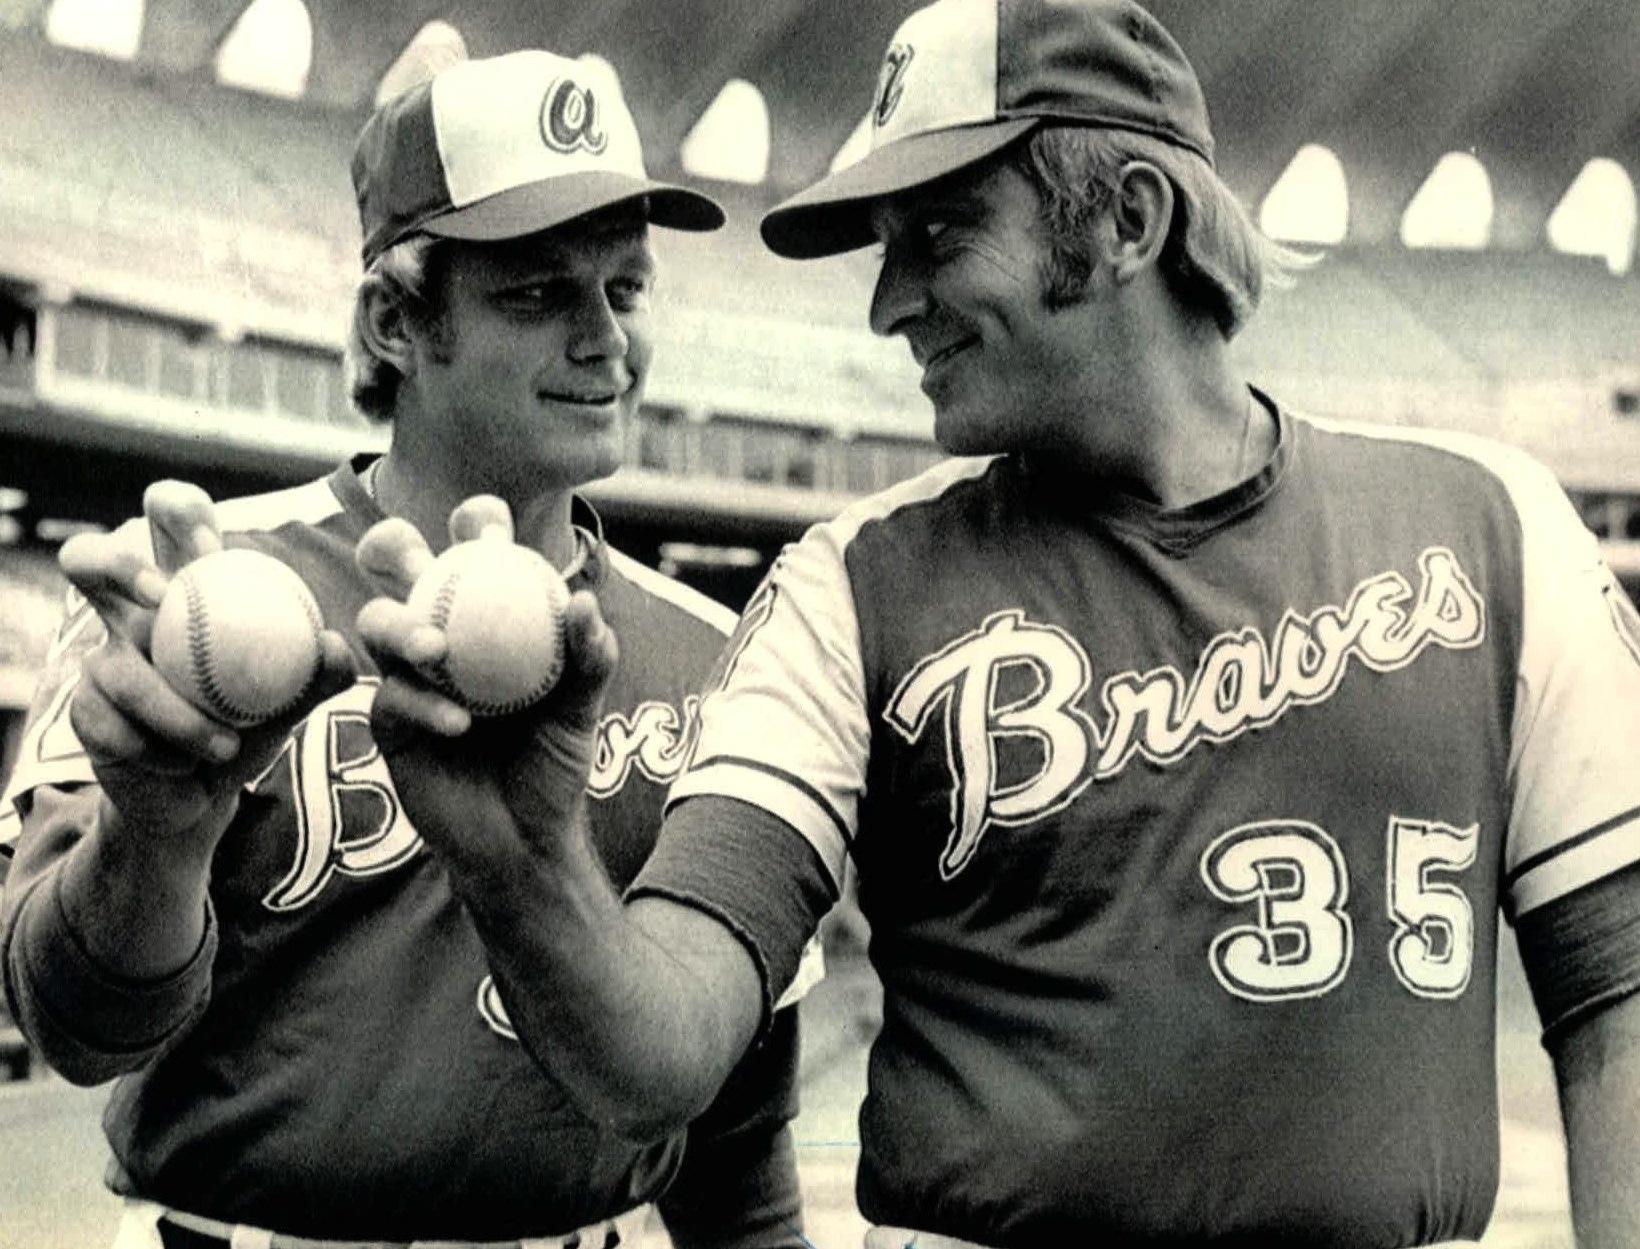 phil and joe niekro braves - baseball brothers same team